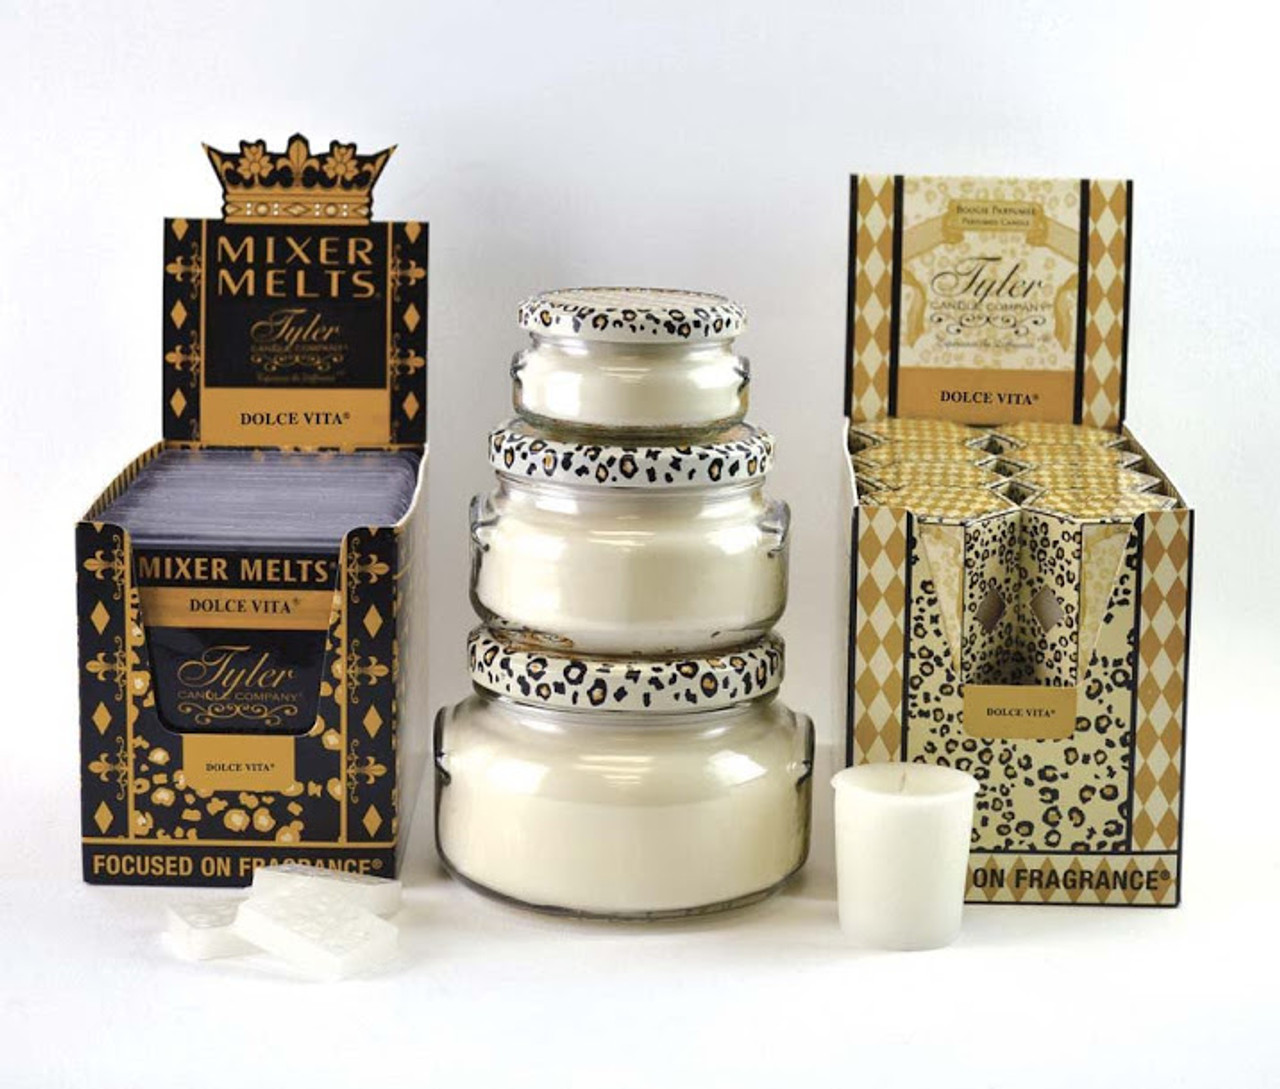 22 oz. DOLCE VITA® Tyler Candle Company